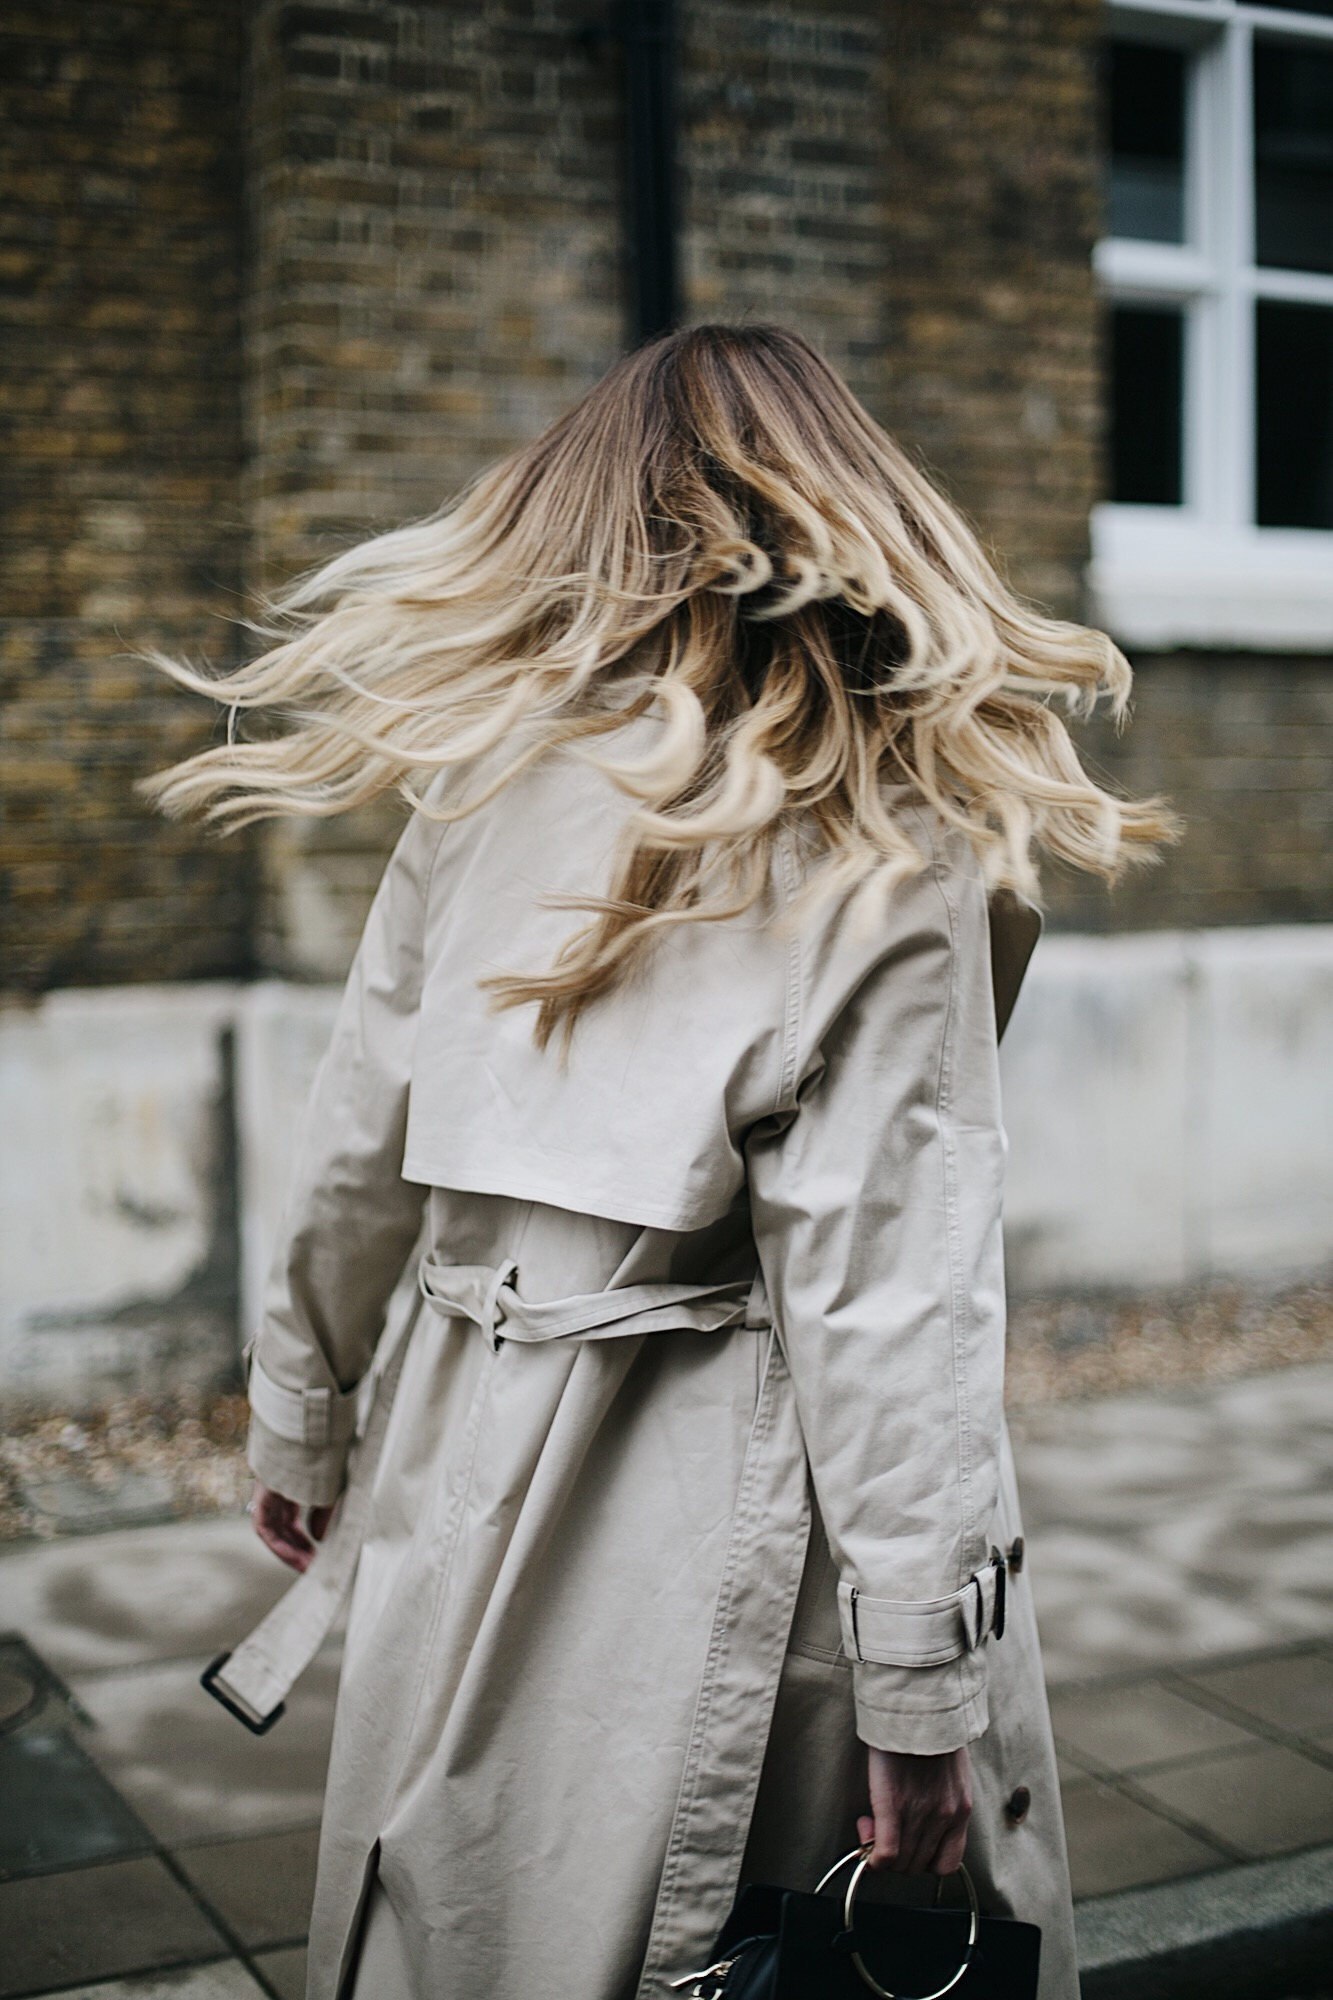 trench coat, long blonde hair